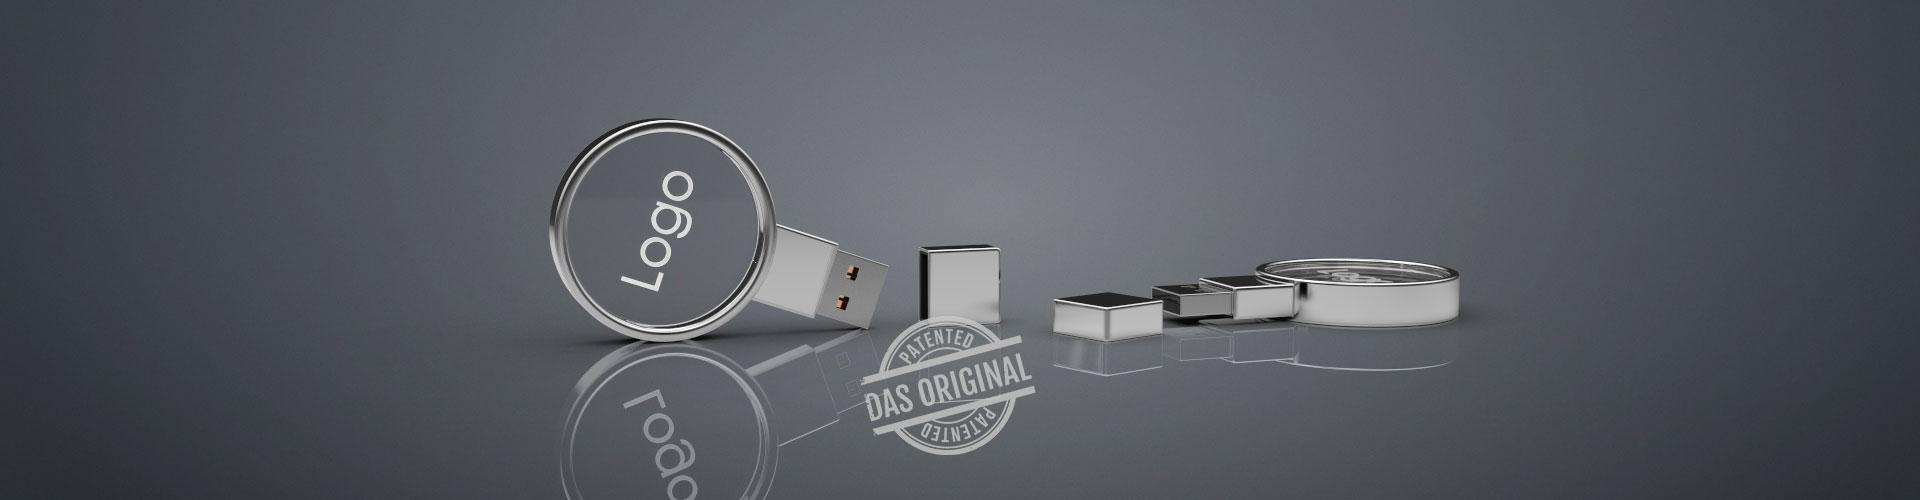 USB Crystal Circle erstes bild - USB CRYSTAL CIRCLE